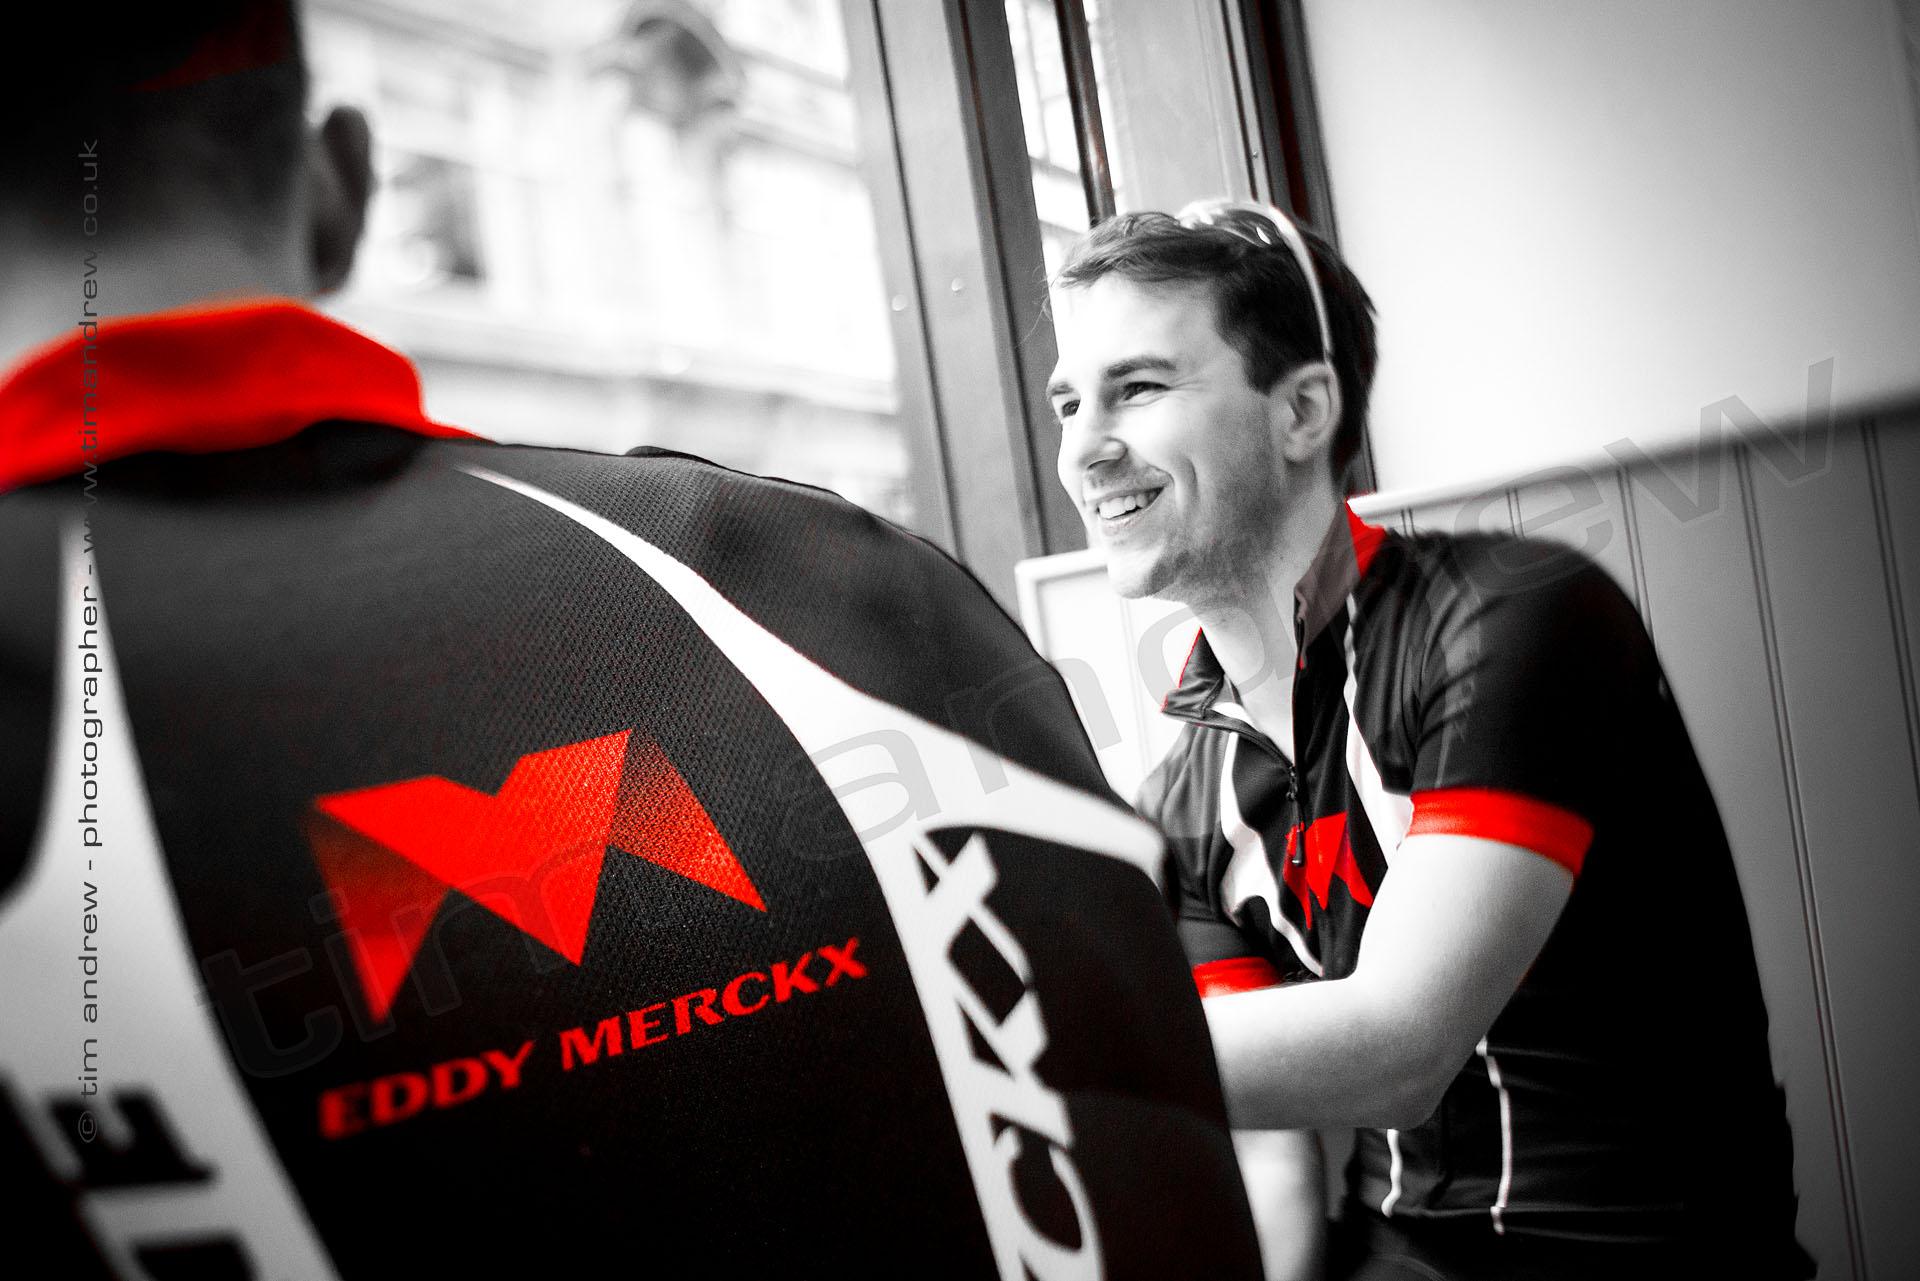 Eddy Merckx road bikes in Rapha